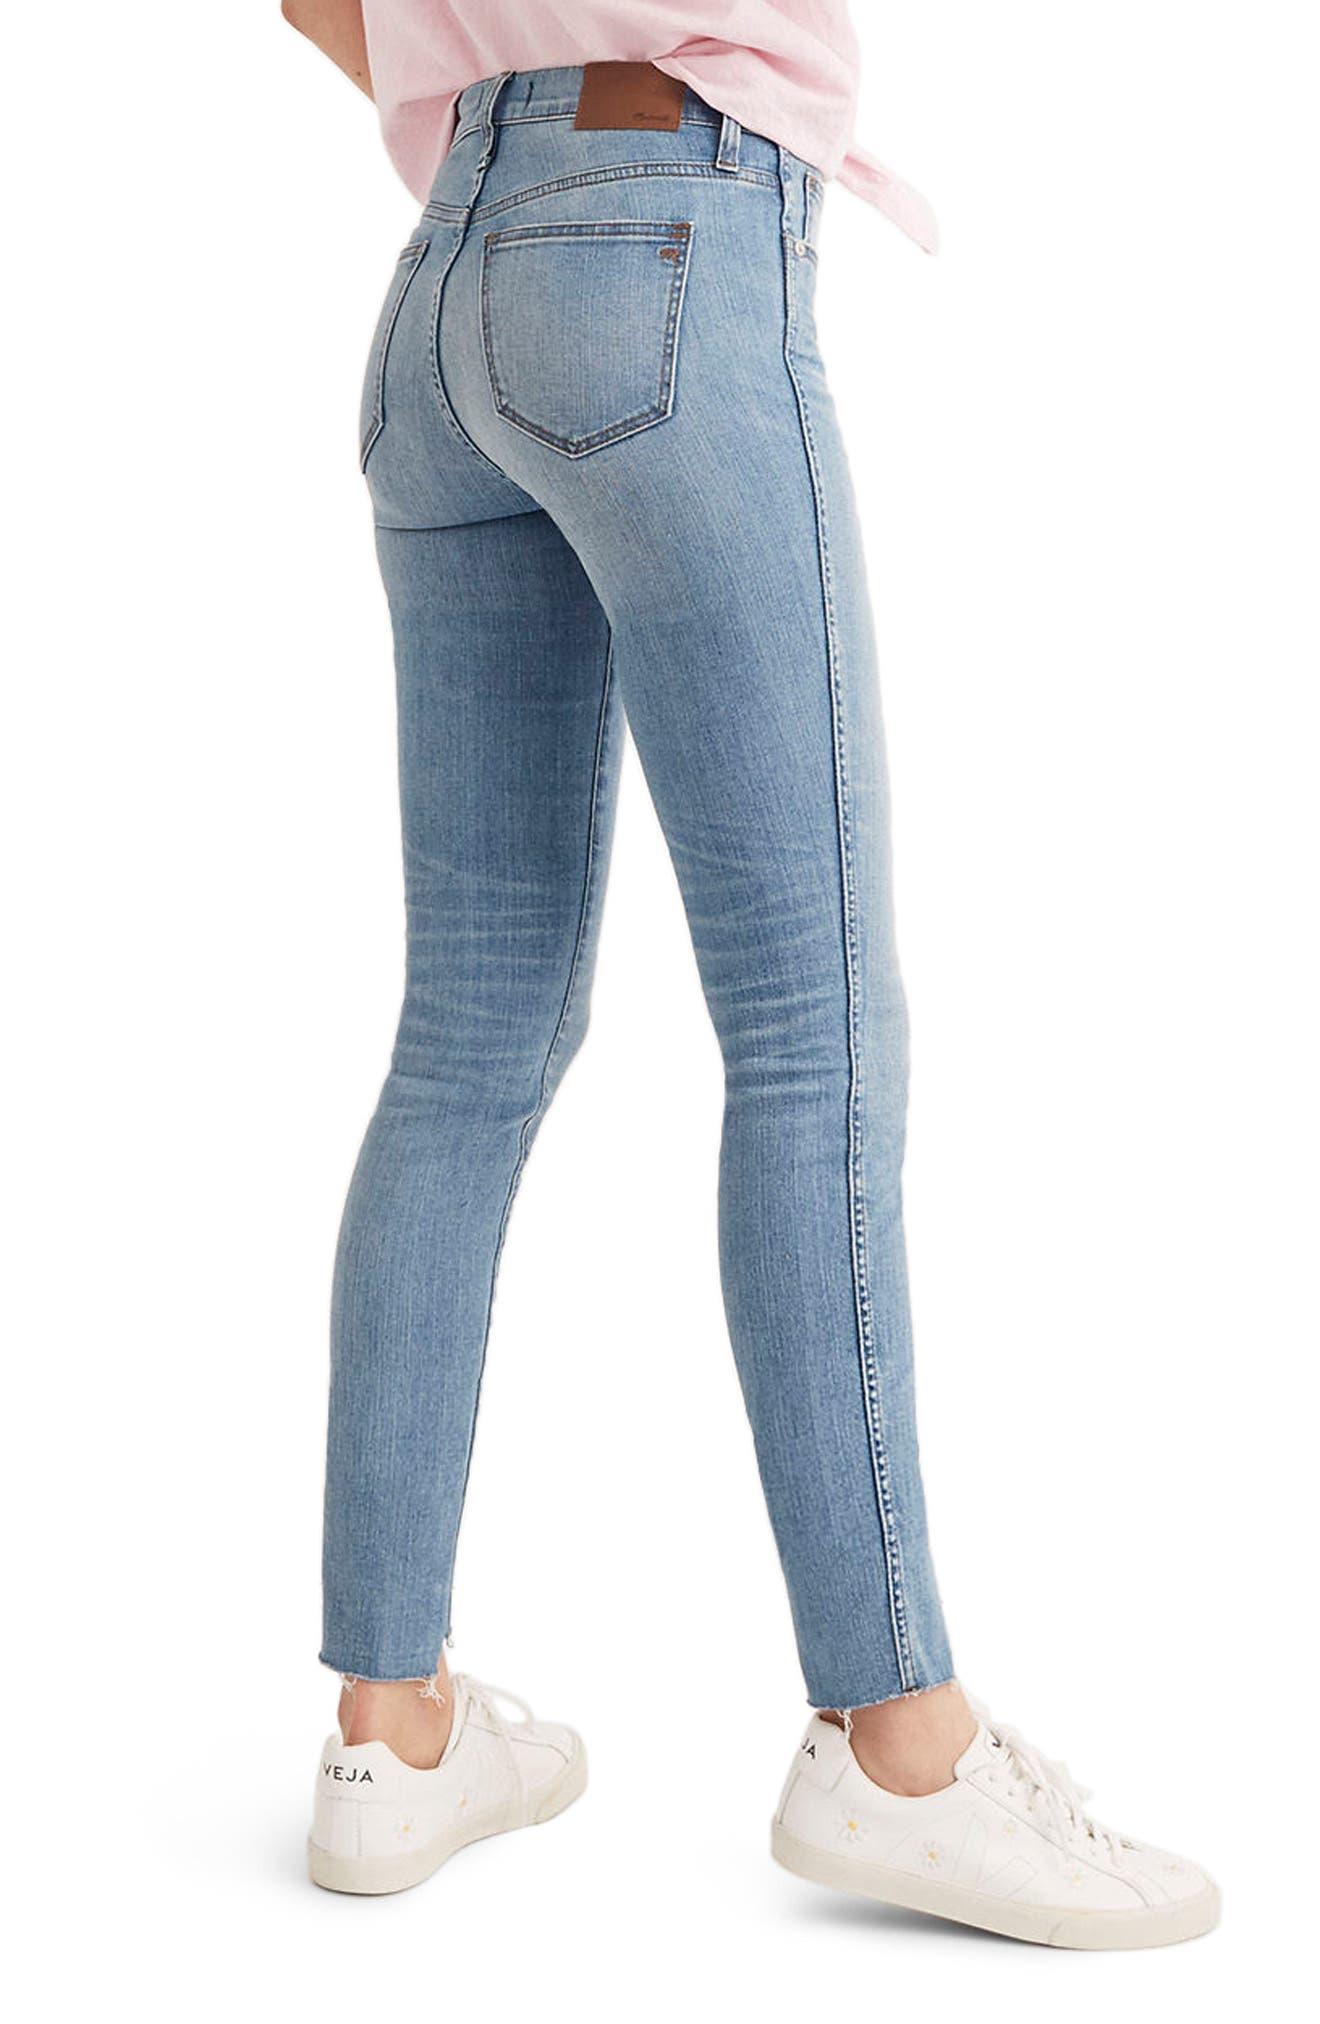 MADEWELL, 9-Inch High Waist Seamed Step-Hem Edition Skinny Jeans, Alternate thumbnail 2, color, 400